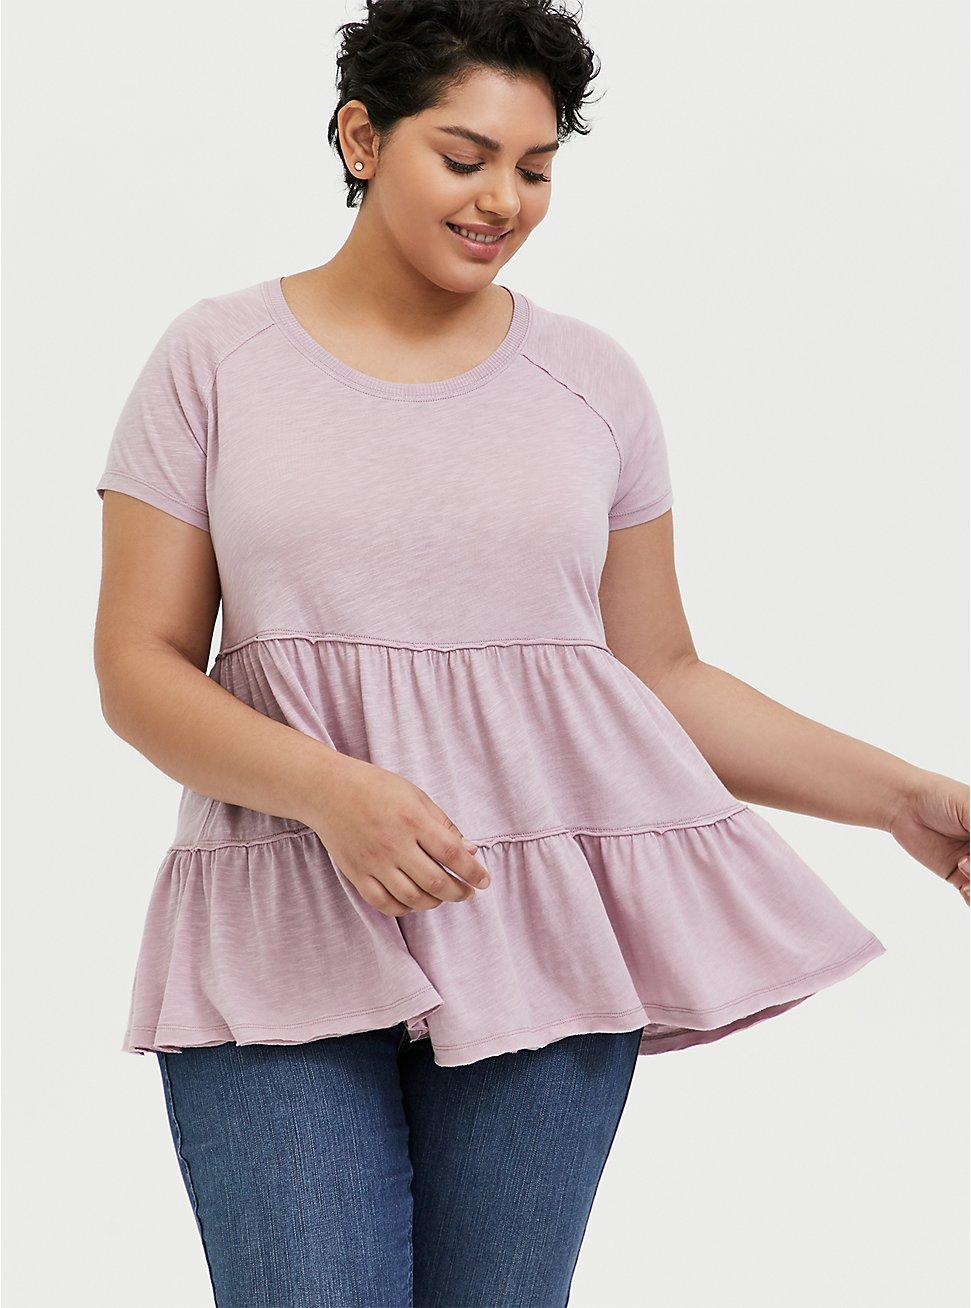 Mauve Pink Shirred Babydoll Top, MAUVE SHADOWS, hi-res